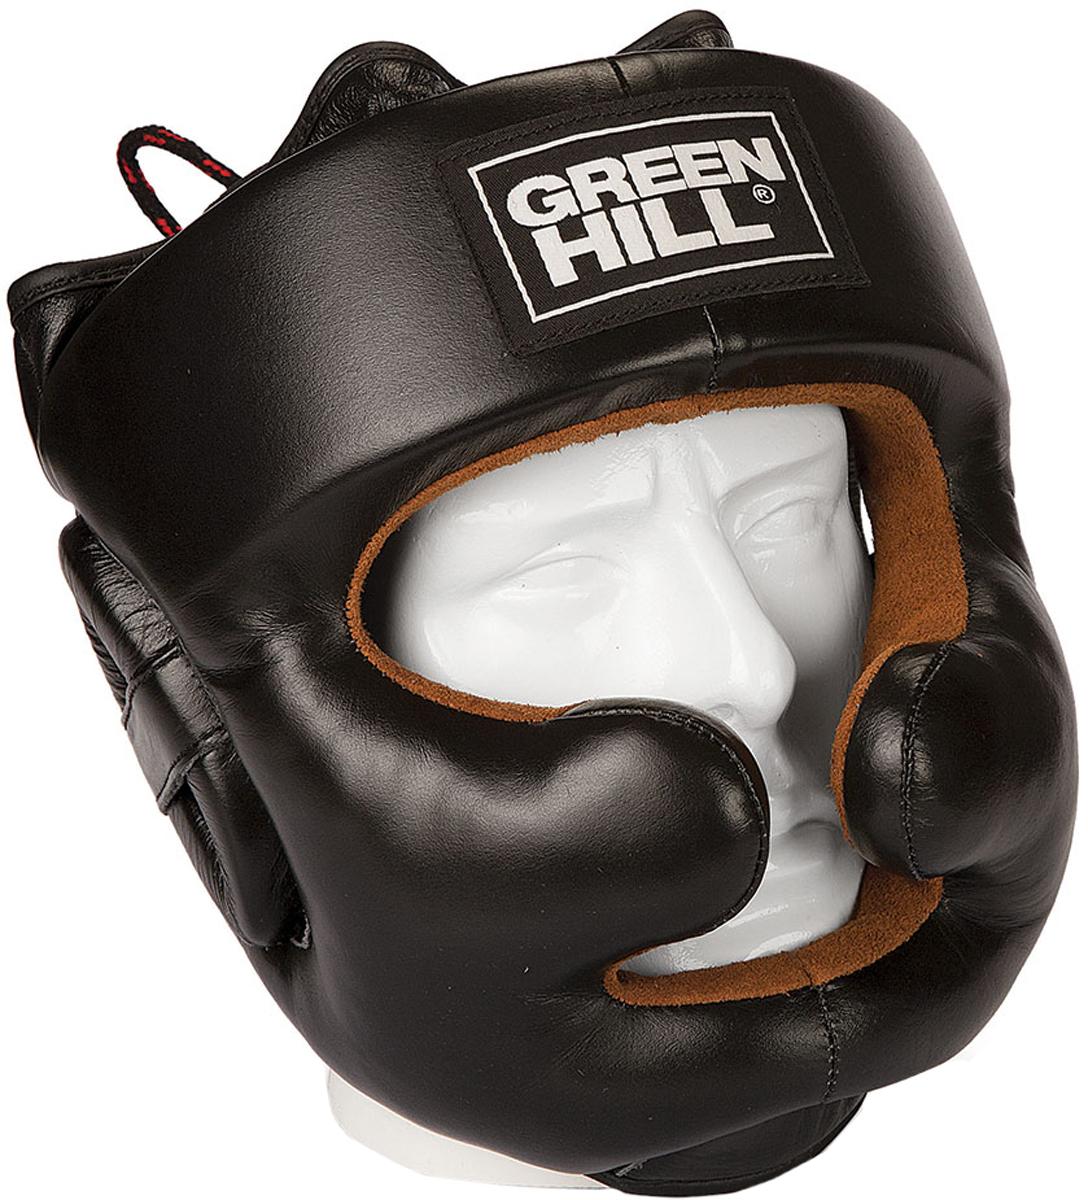 Шлем боксерский Green Hill  Lux , цвет: черный. HGL-9049. Размер XL - Бокс